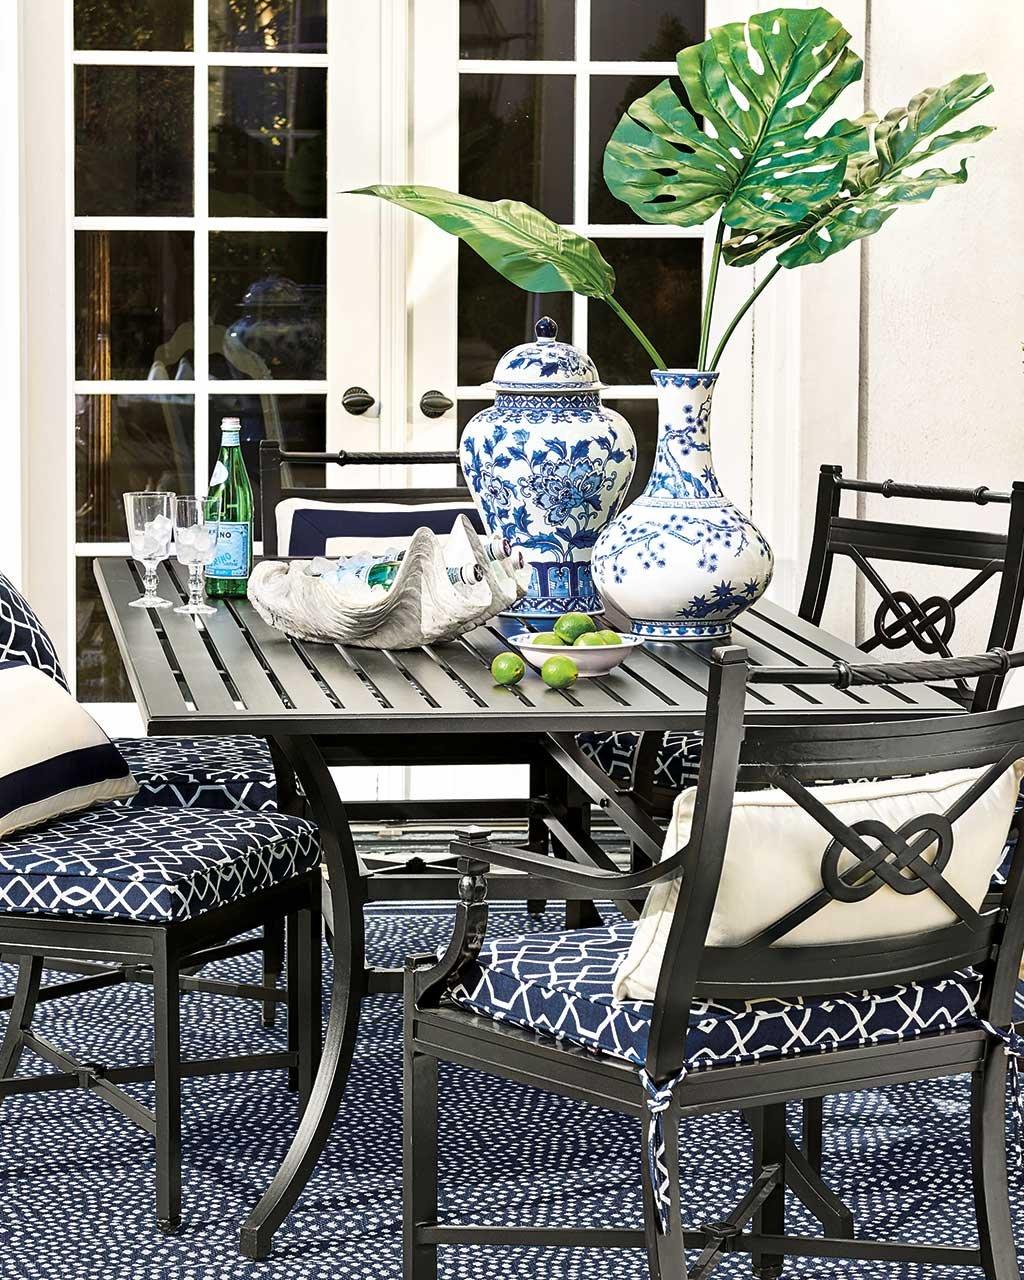 10 outdoor centerpiece ideas how to